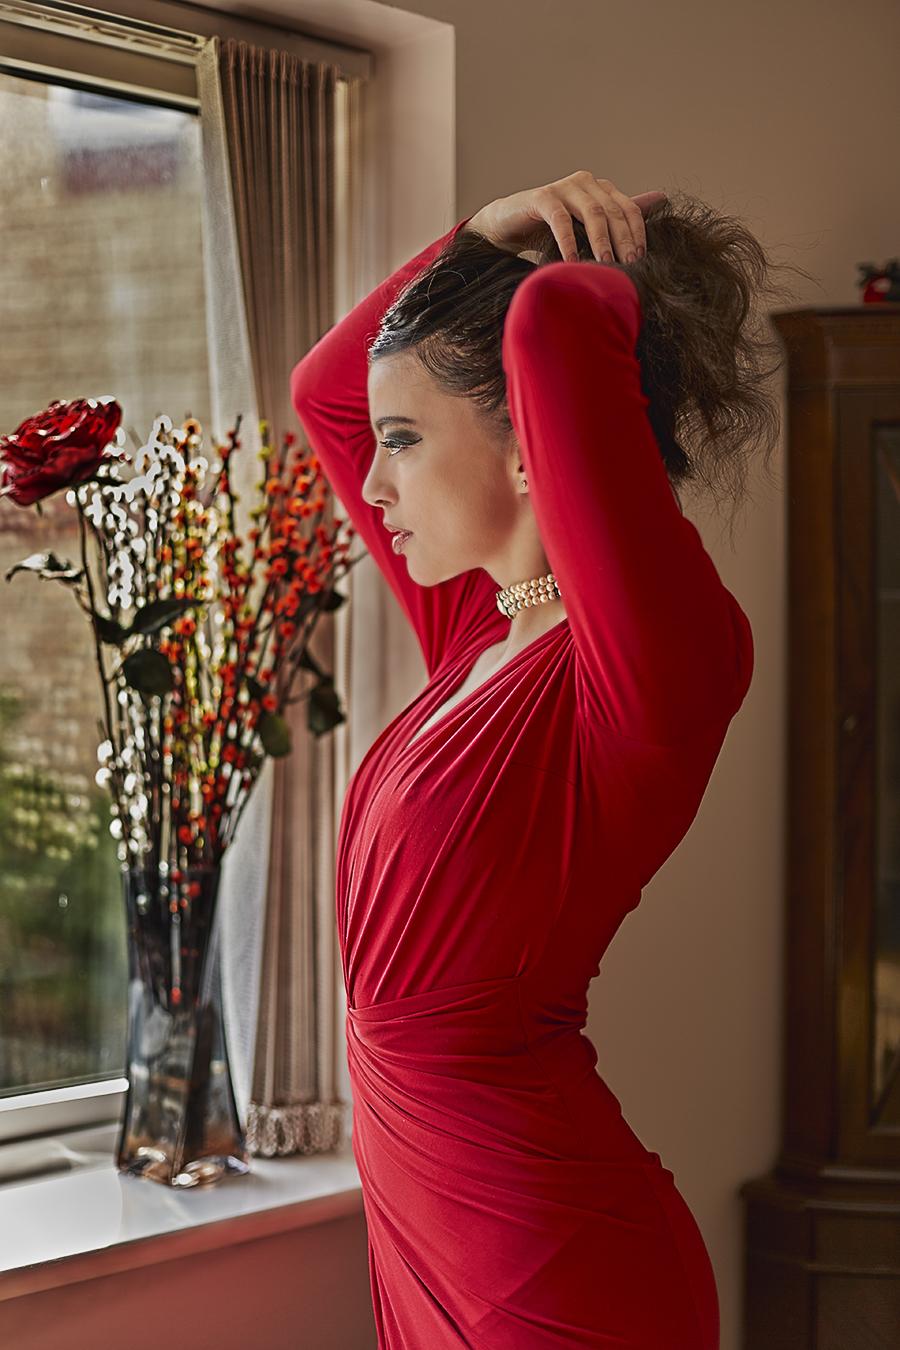 Photography by GaryMac Photography, Model Helen Diaz / Uploaded 10th April 2018 @ 01:01 AM